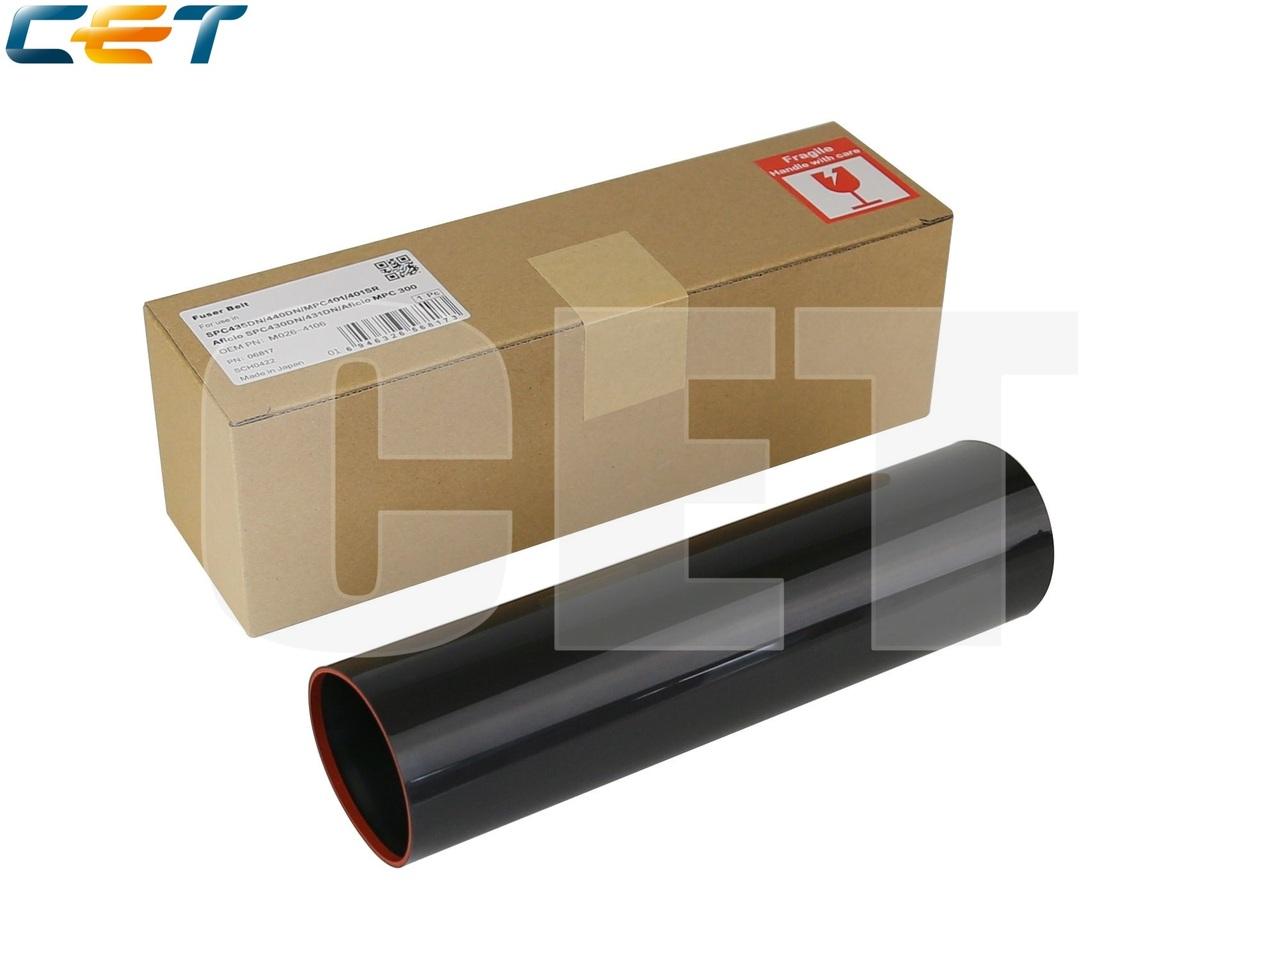 Термопленка M026-4106 для RICOH AficioSPC430DN/431DN/440DN/MPC300SR/400SR/401 (CET),CET6817